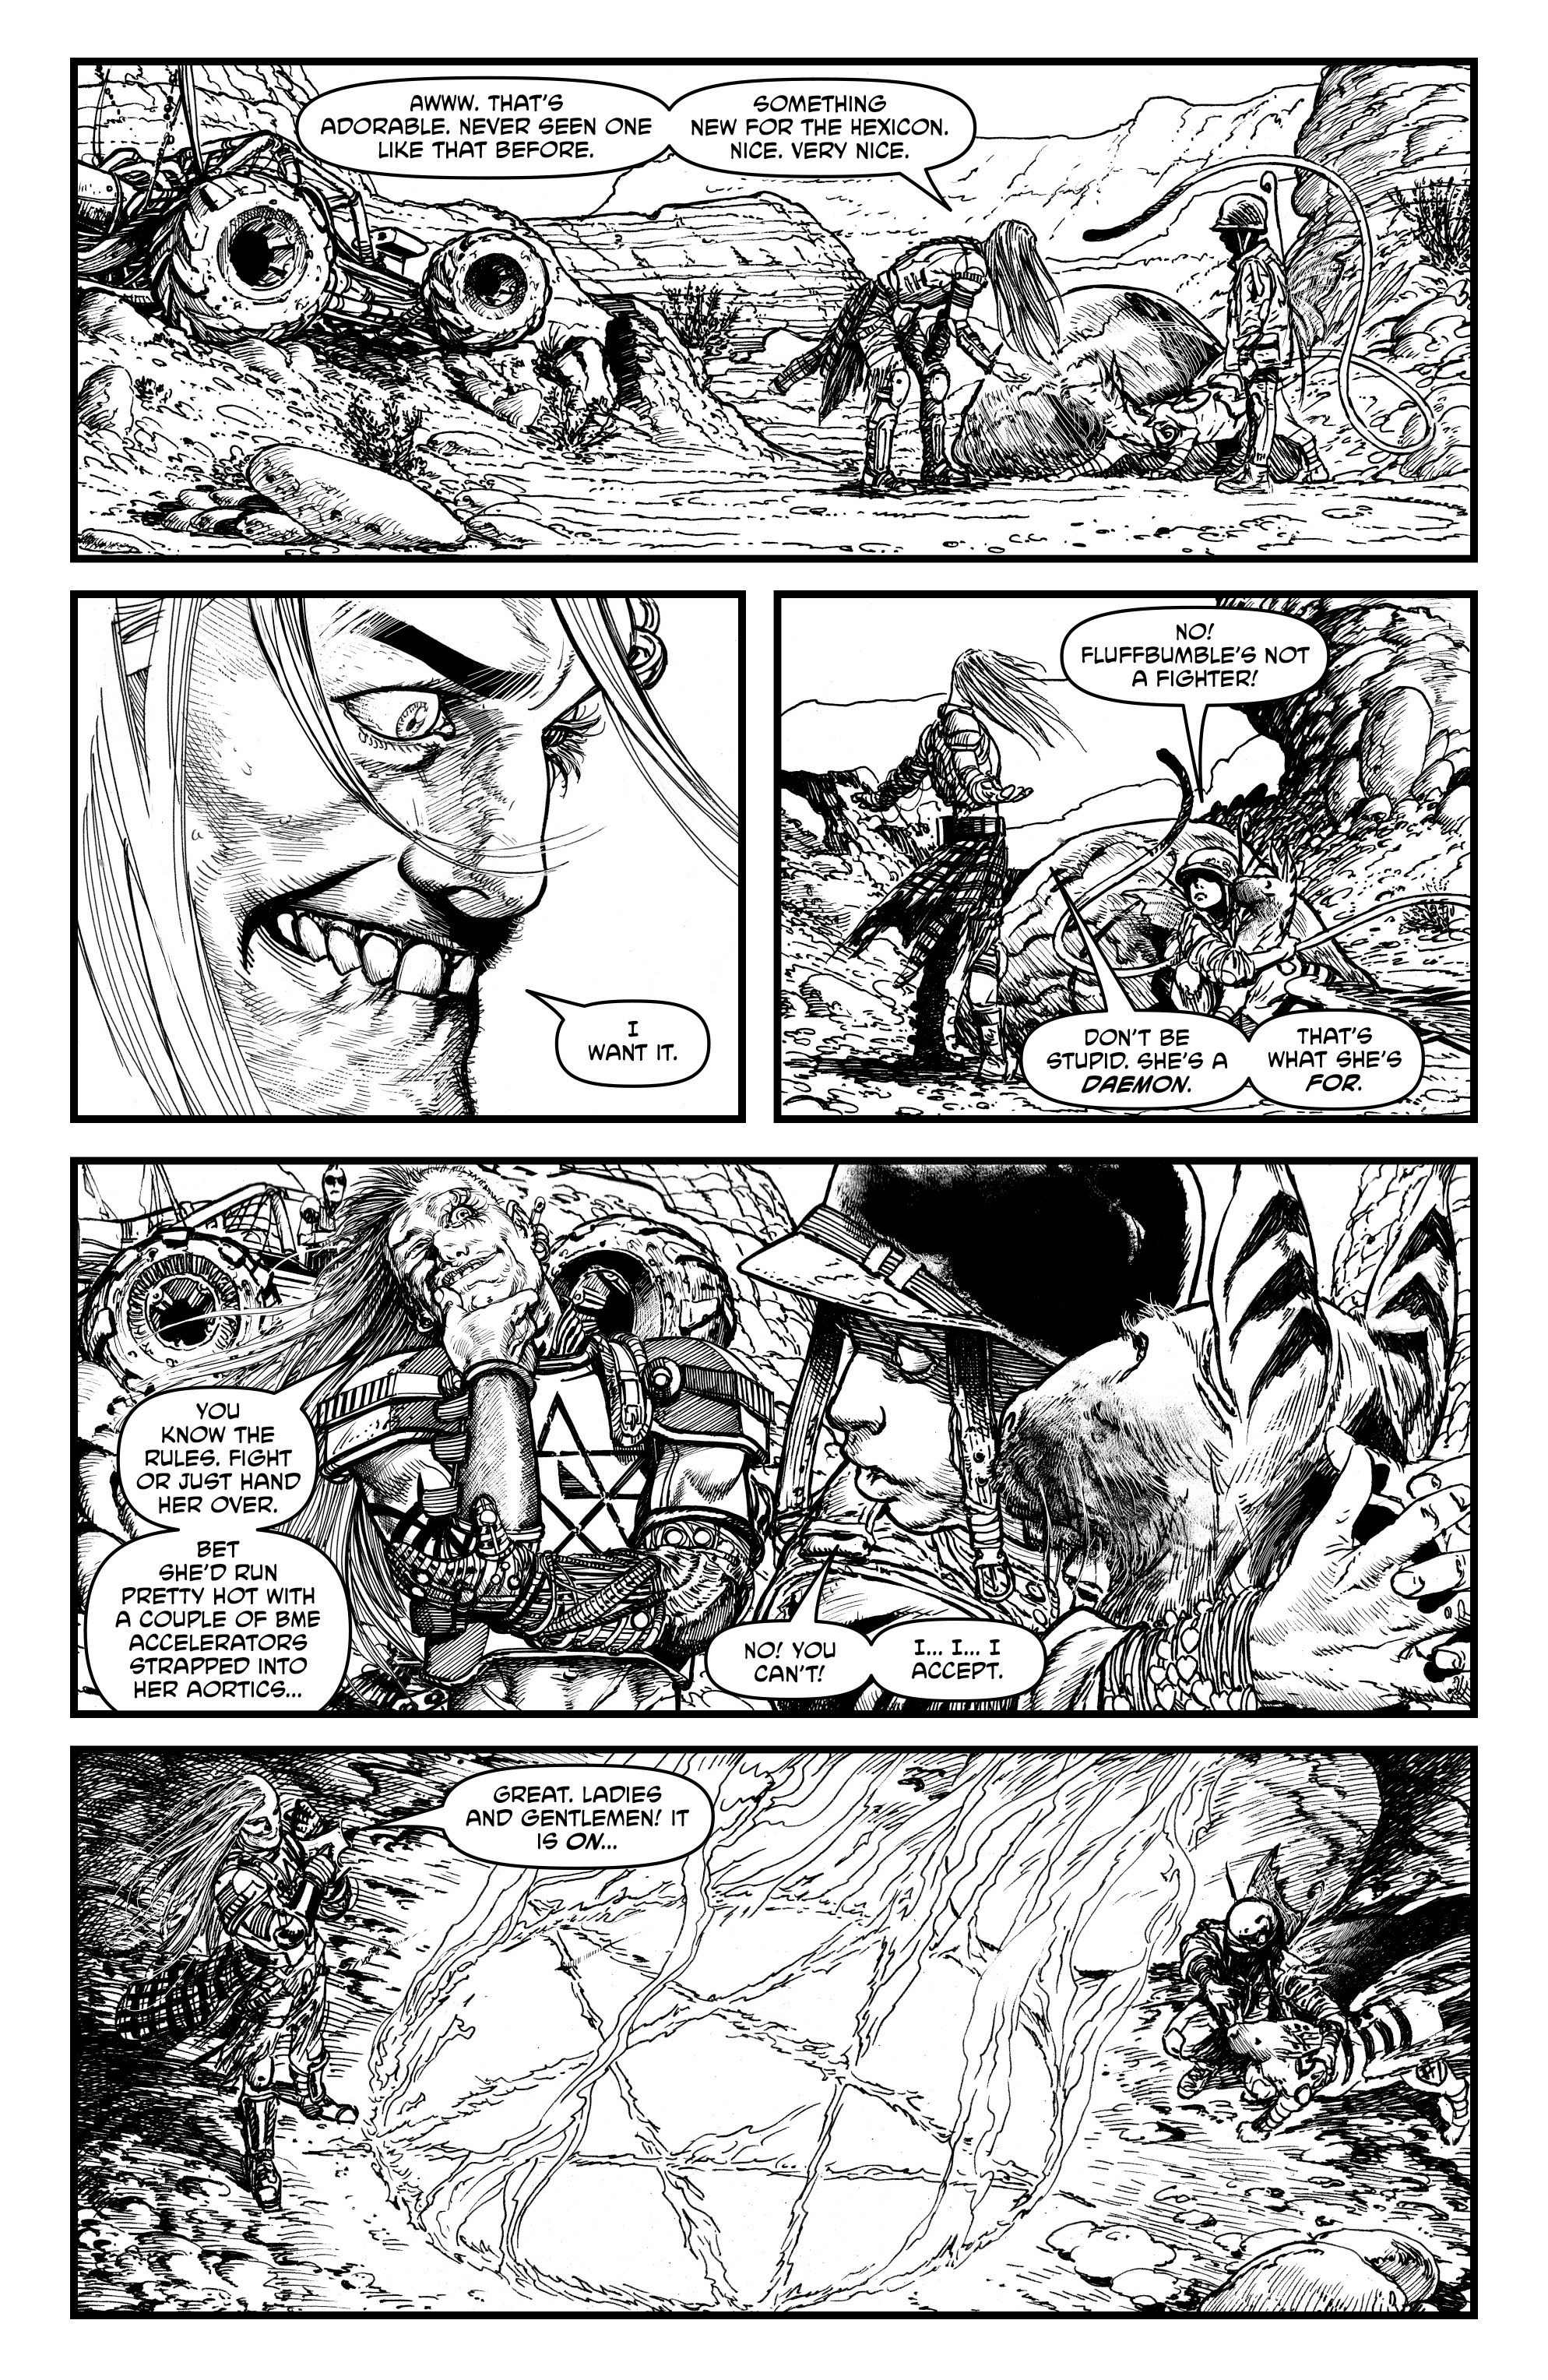 Read online Alan Moore's Cinema Purgatorio comic -  Issue #1 - 27